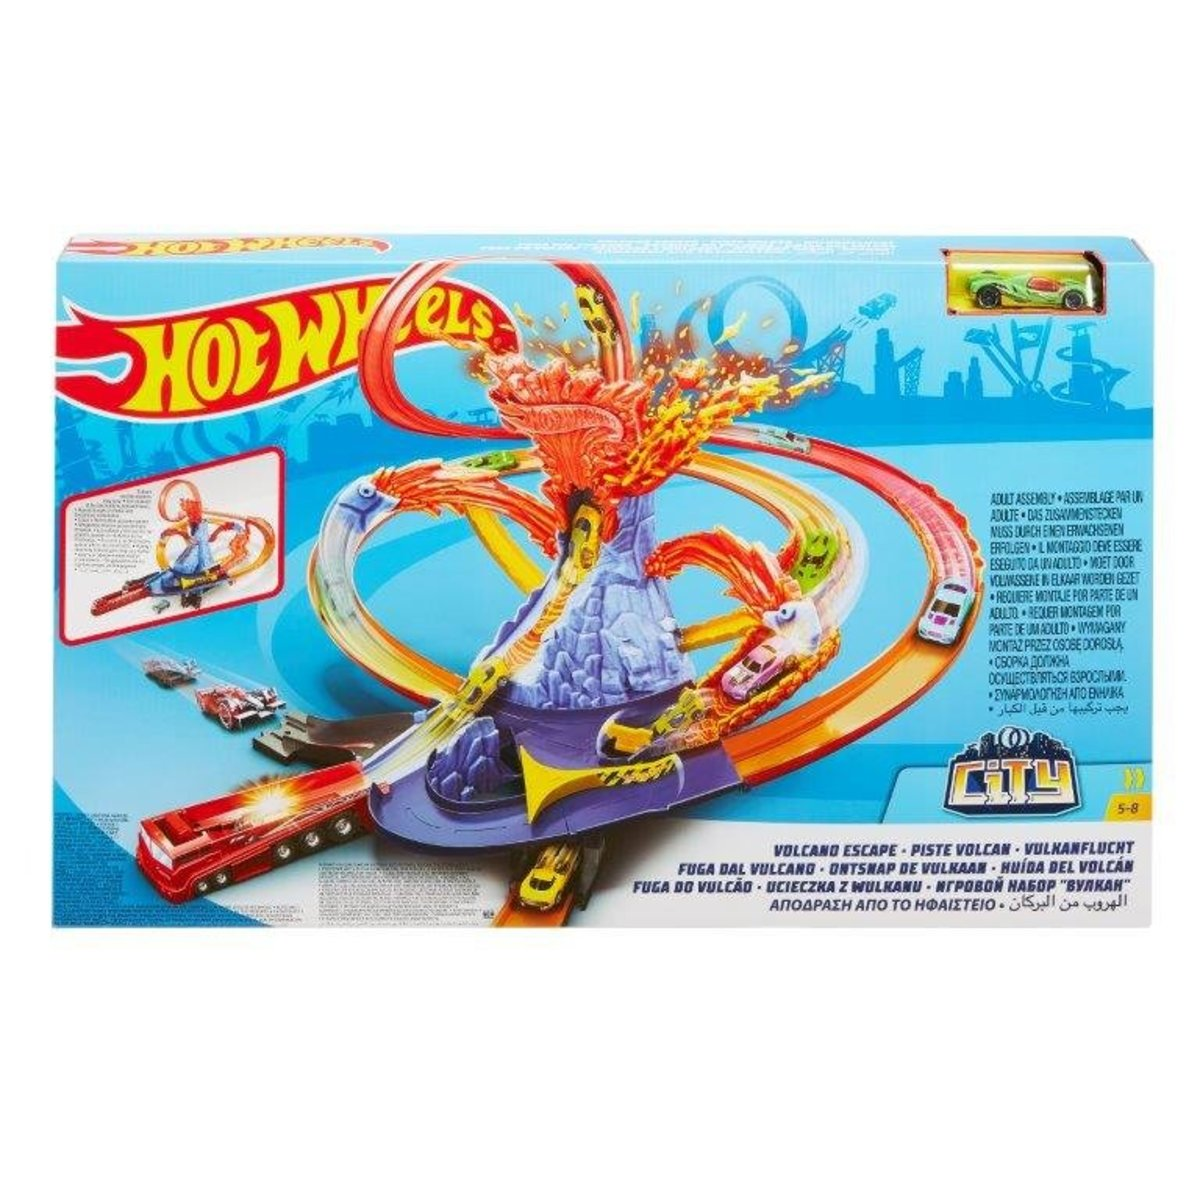 Hot Wheels Volcano Escape Play Set